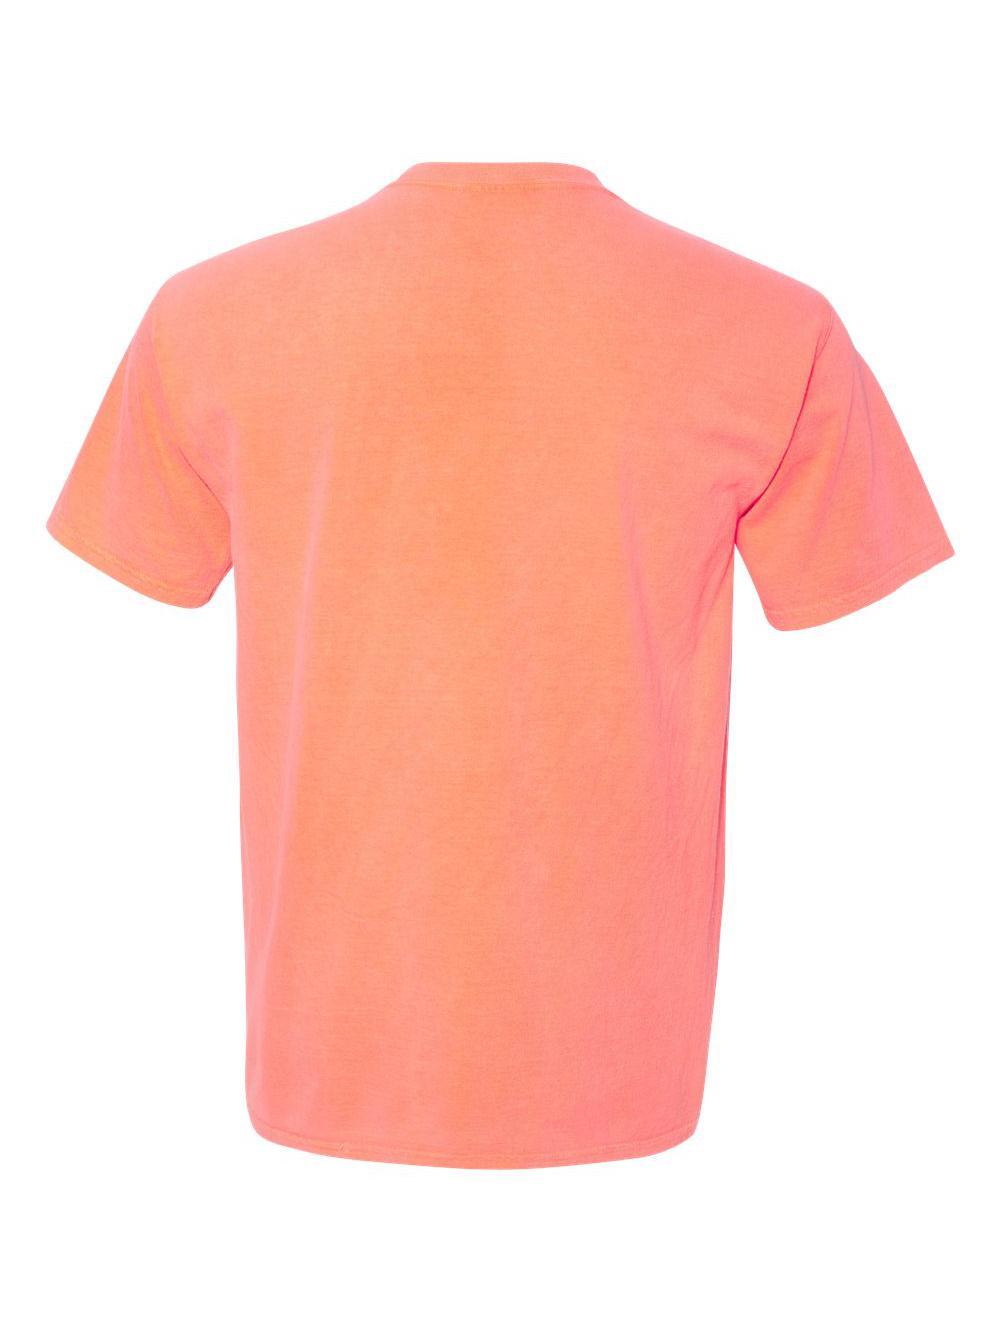 Comfort-Colors-Garment-Dyed-Heavyweight-Ringspun-Short-Sleeve-Shirt-1717 thumbnail 100